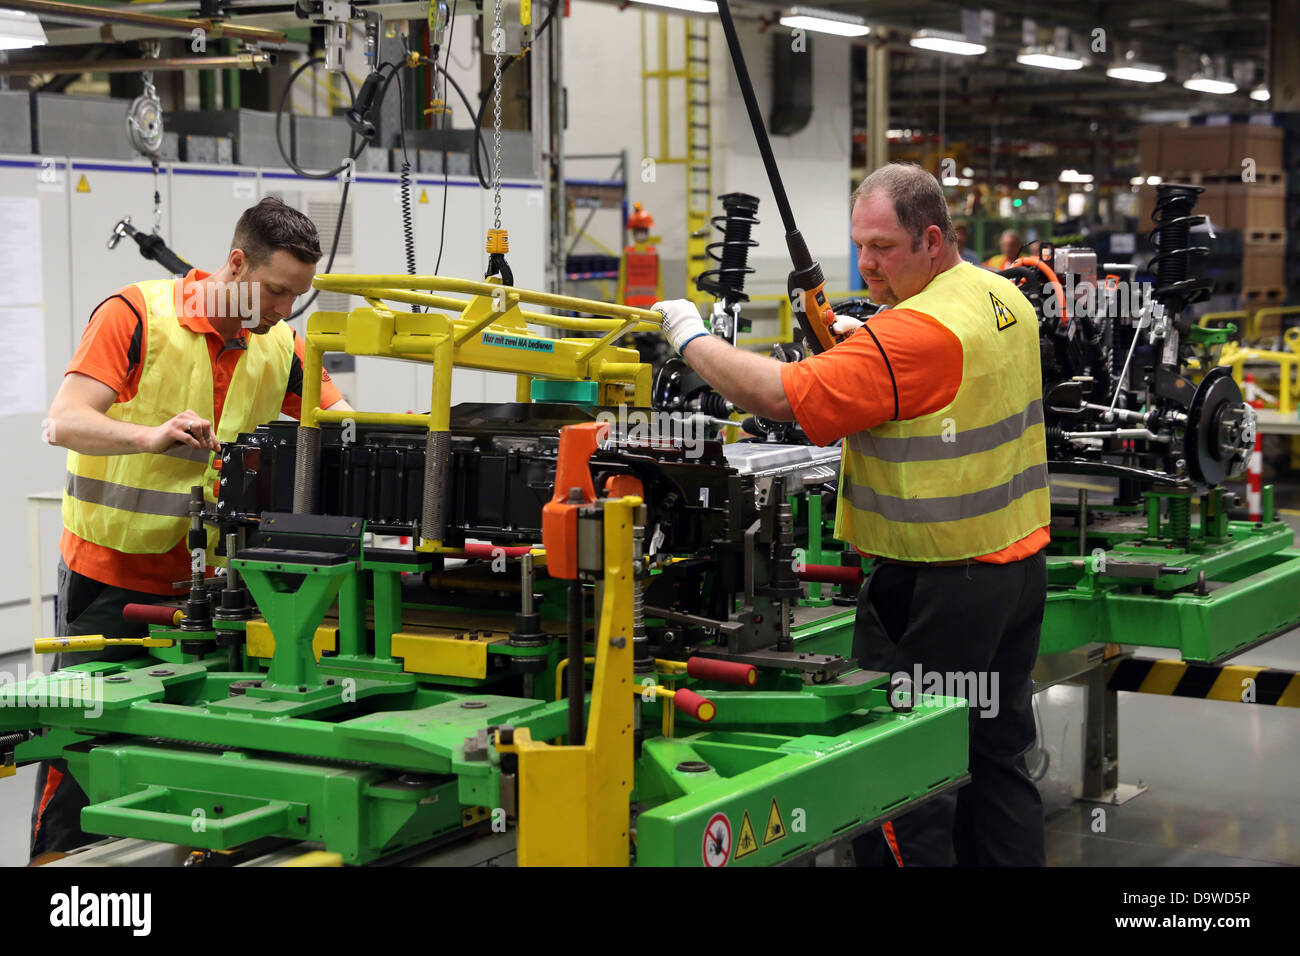 Saarlouis, 12.6.2013 - Produktion linea des Ford Focus elettrica. Foto: Ford Werke GmbH/Stark Immagini Stock